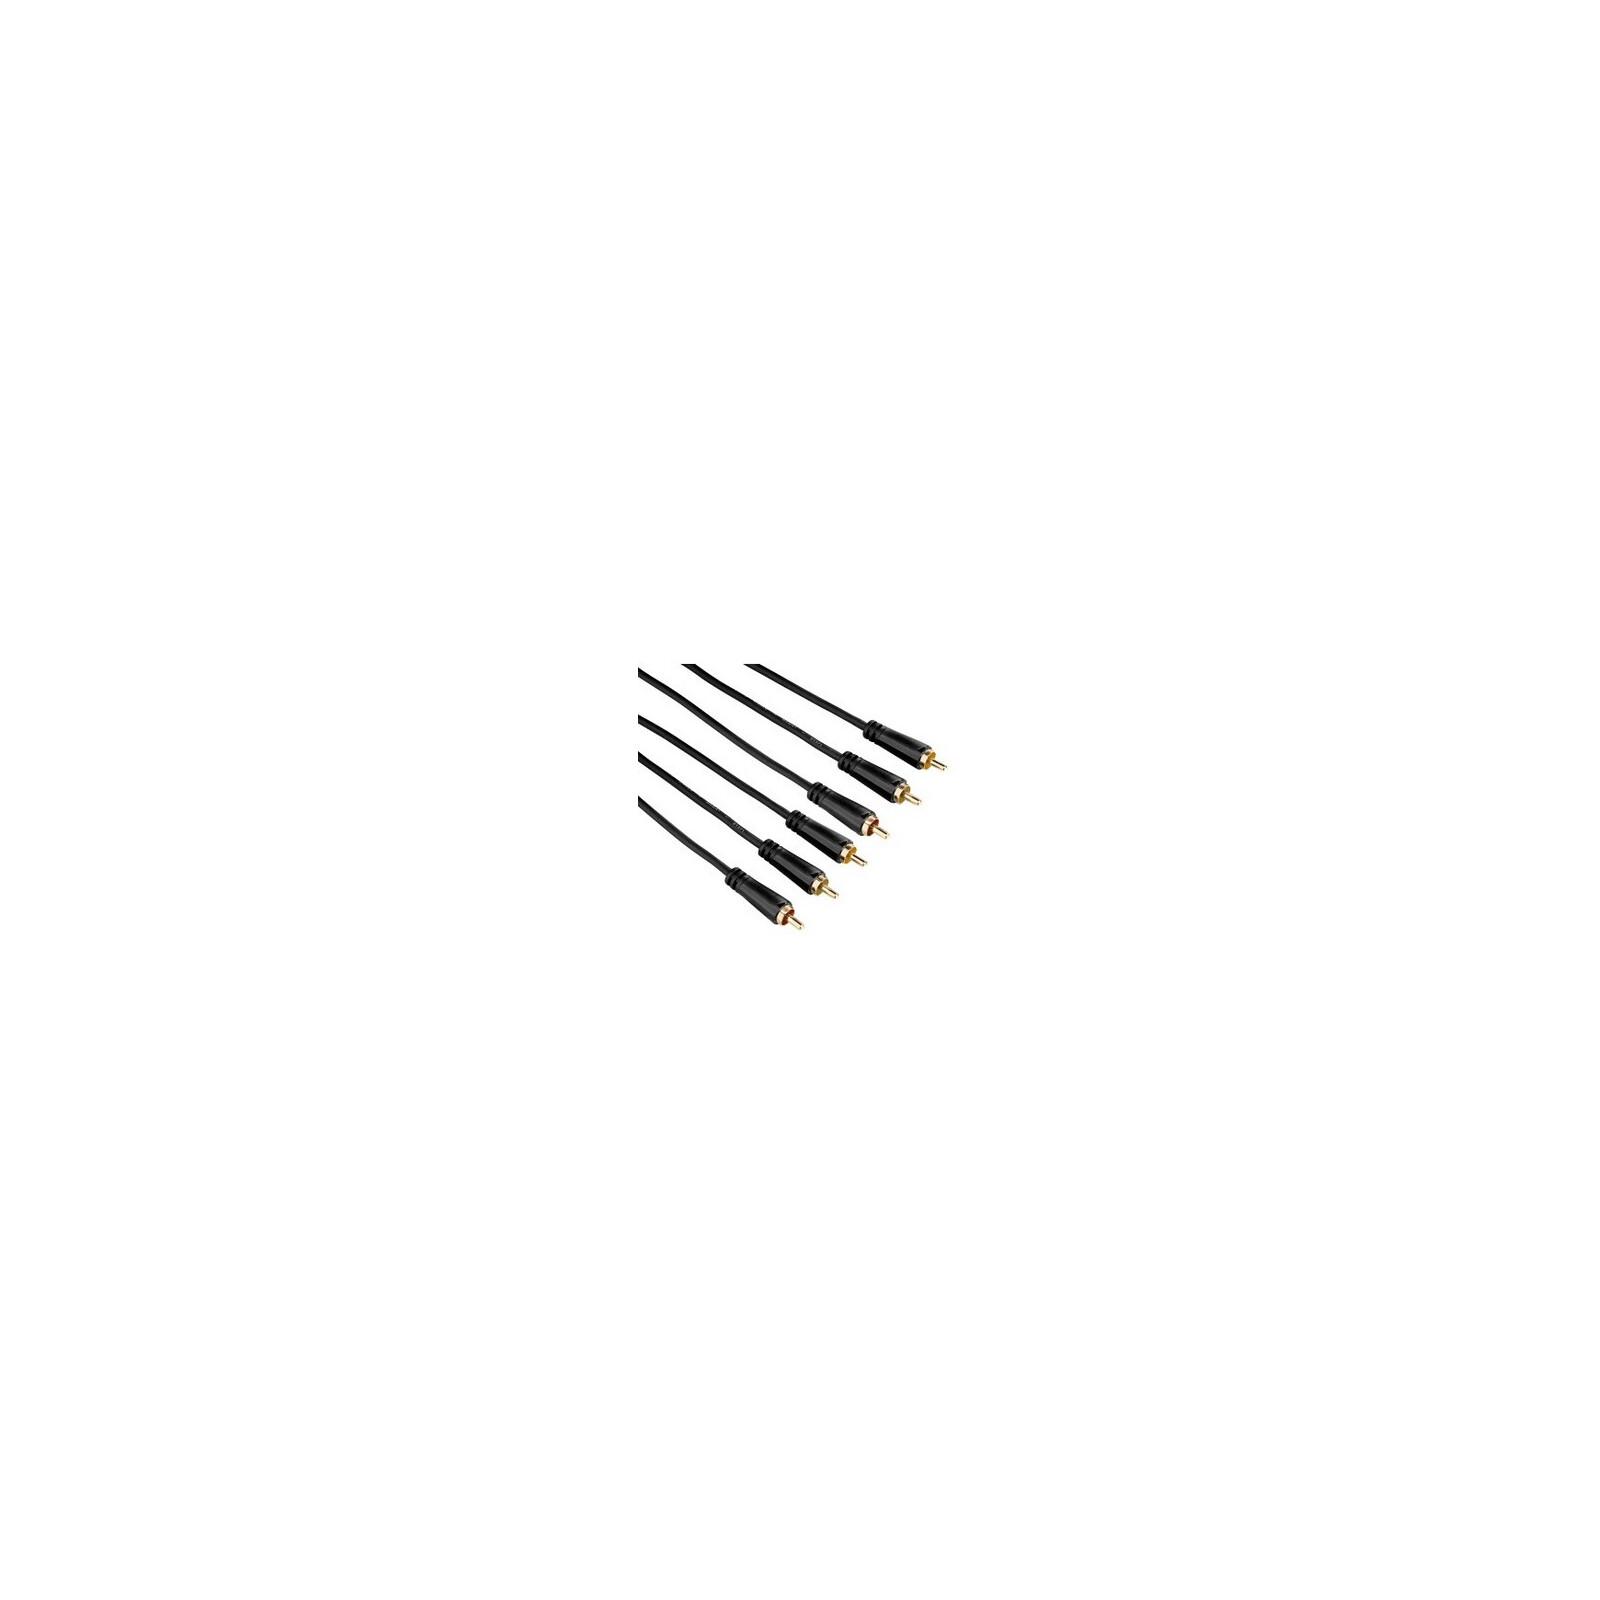 Hama 122157 Audio/-Video Kabel 3 Cinch-Stecker